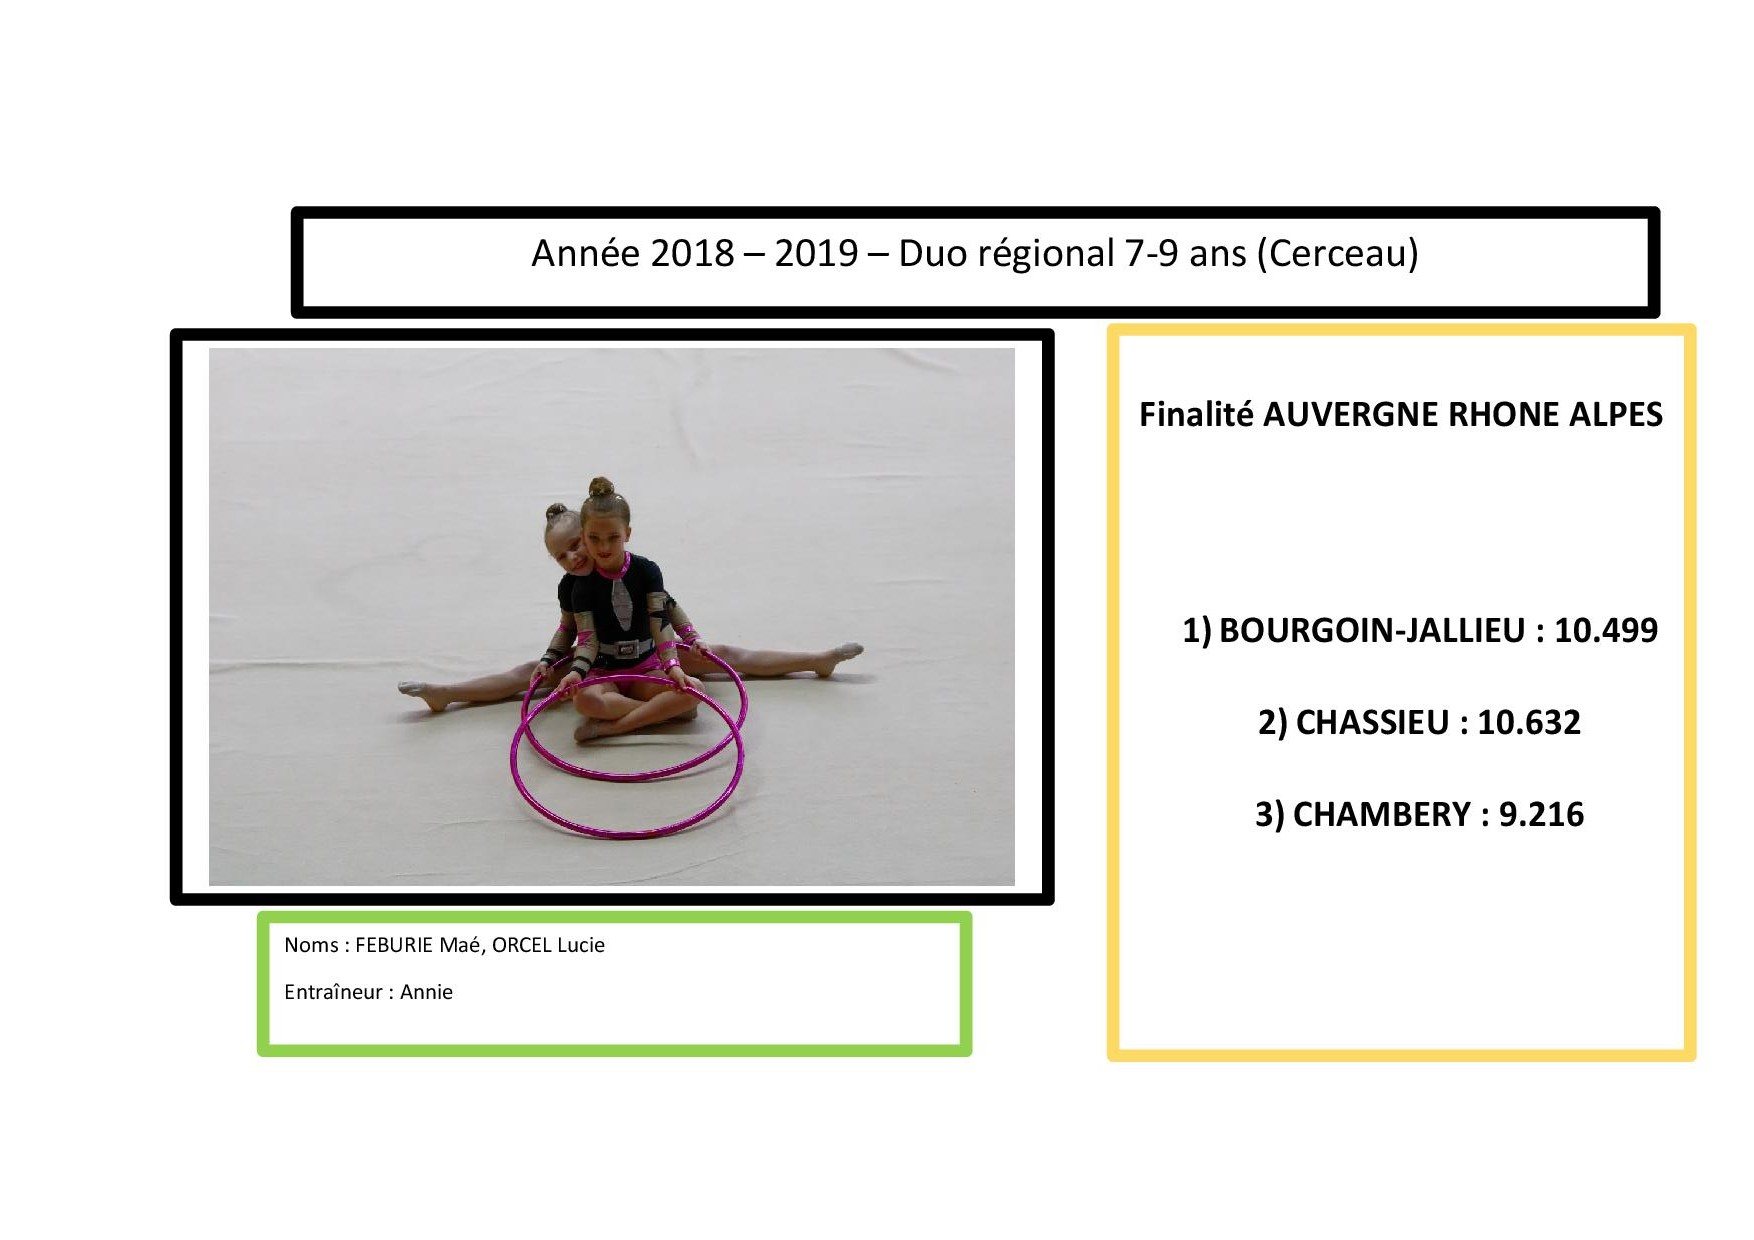 50 Document trombinoscope.duo régional 7-9 ansdocx